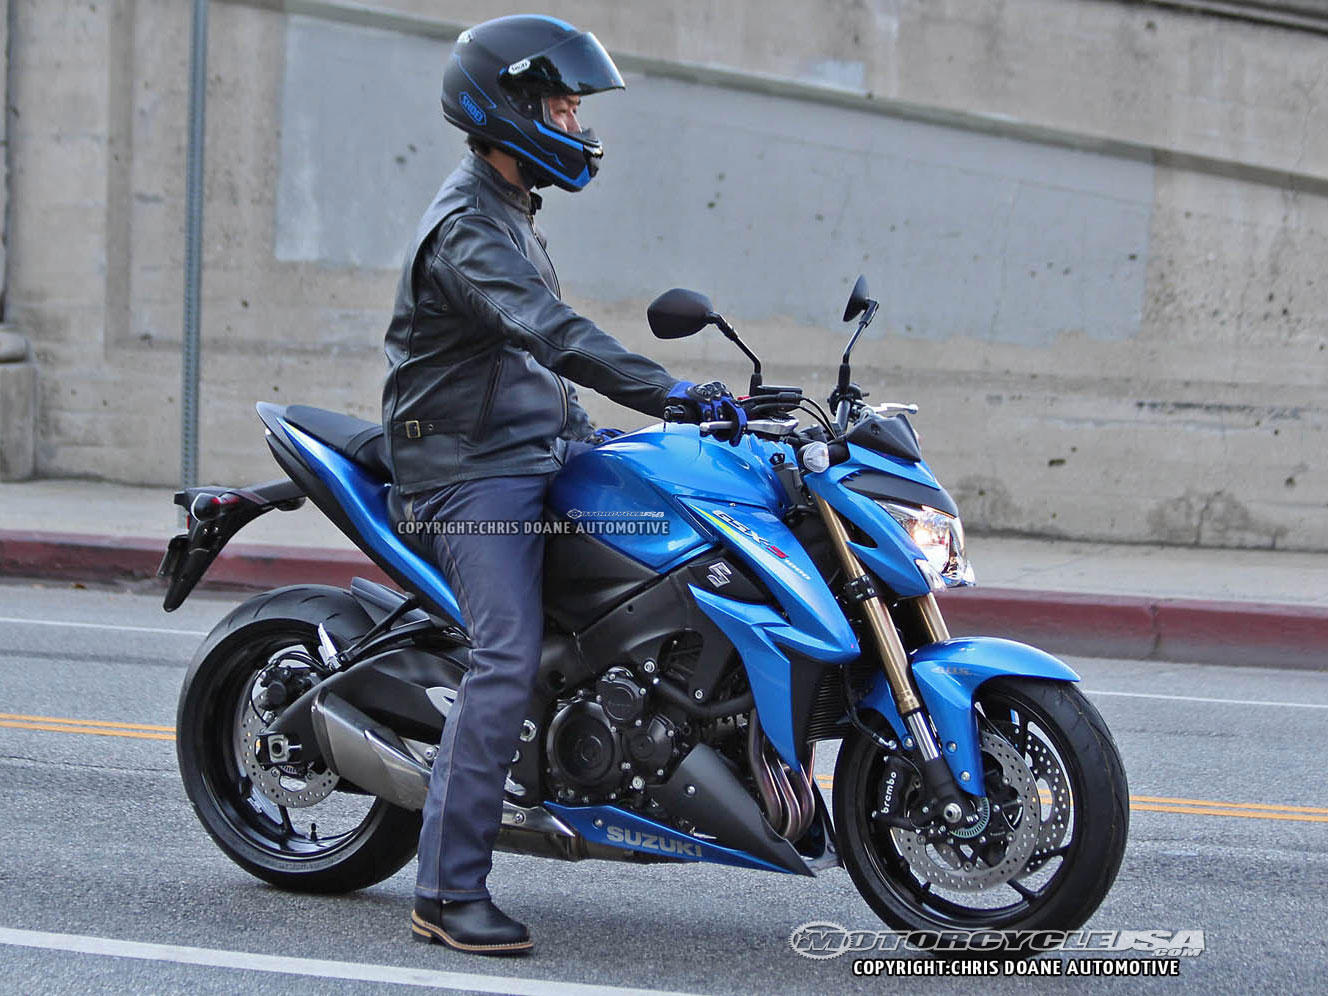 2015 suzuki suzuki gsx s1000 l6 abs for sale in granby ma allpower 413 467 3499 [ 1328 x 996 Pixel ]